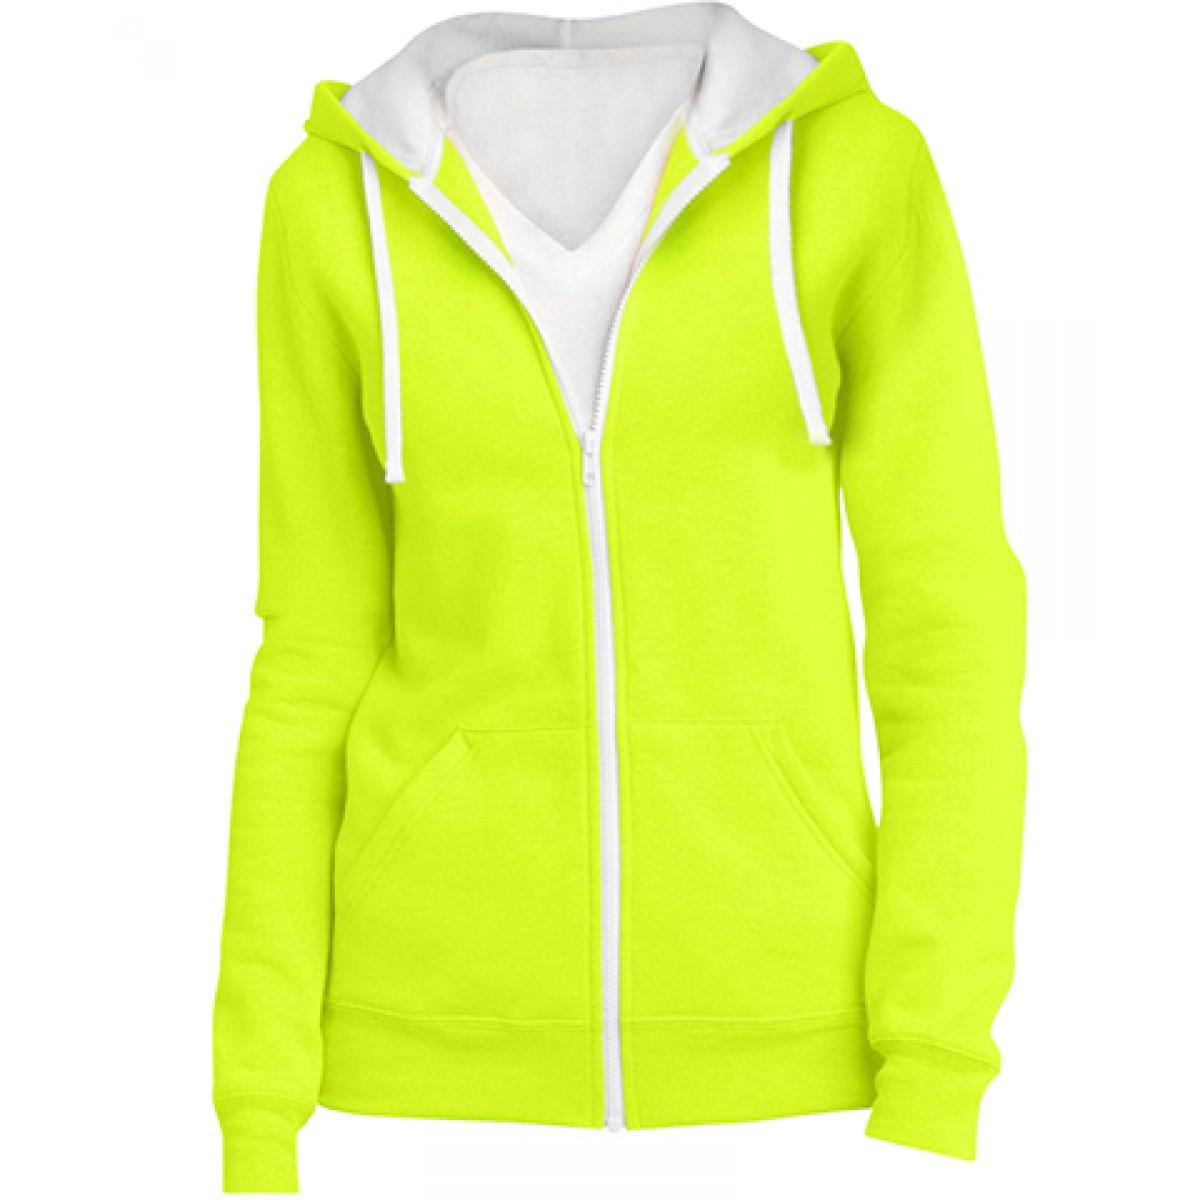 Juniors Full-Zip Hoodie-Safety Green-S